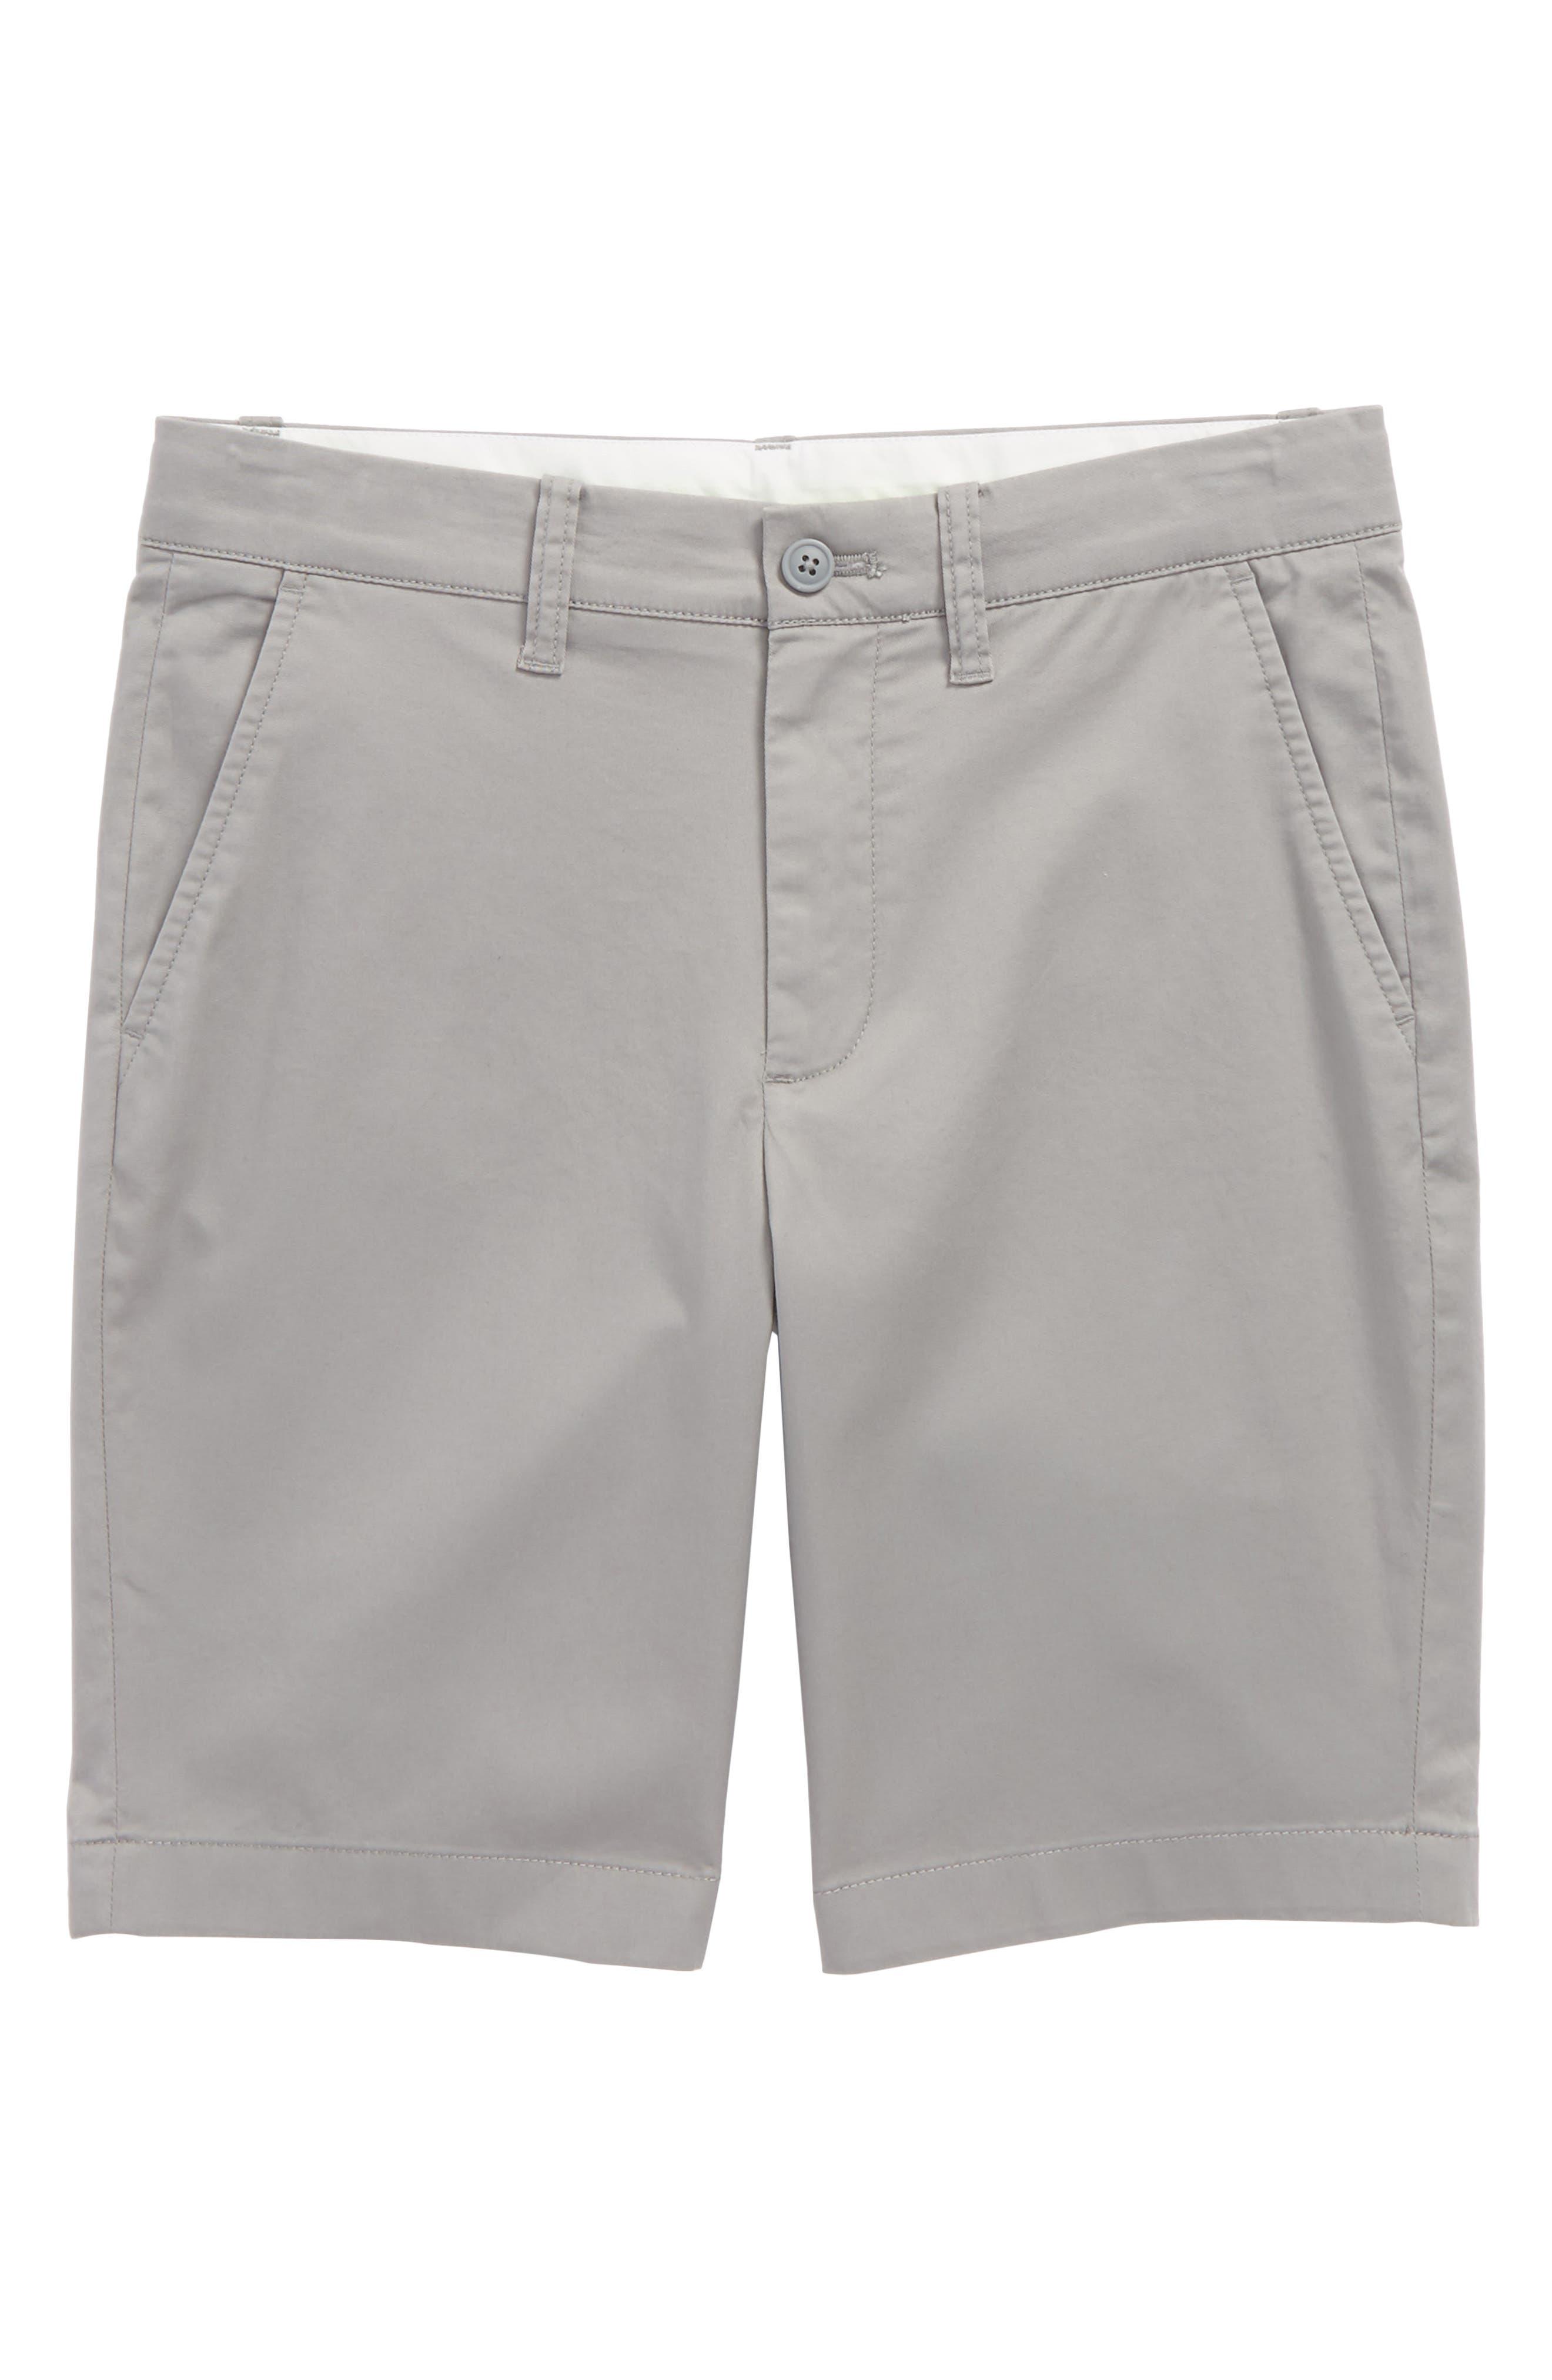 Stanton Chino Shorts,                         Main,                         color, 020